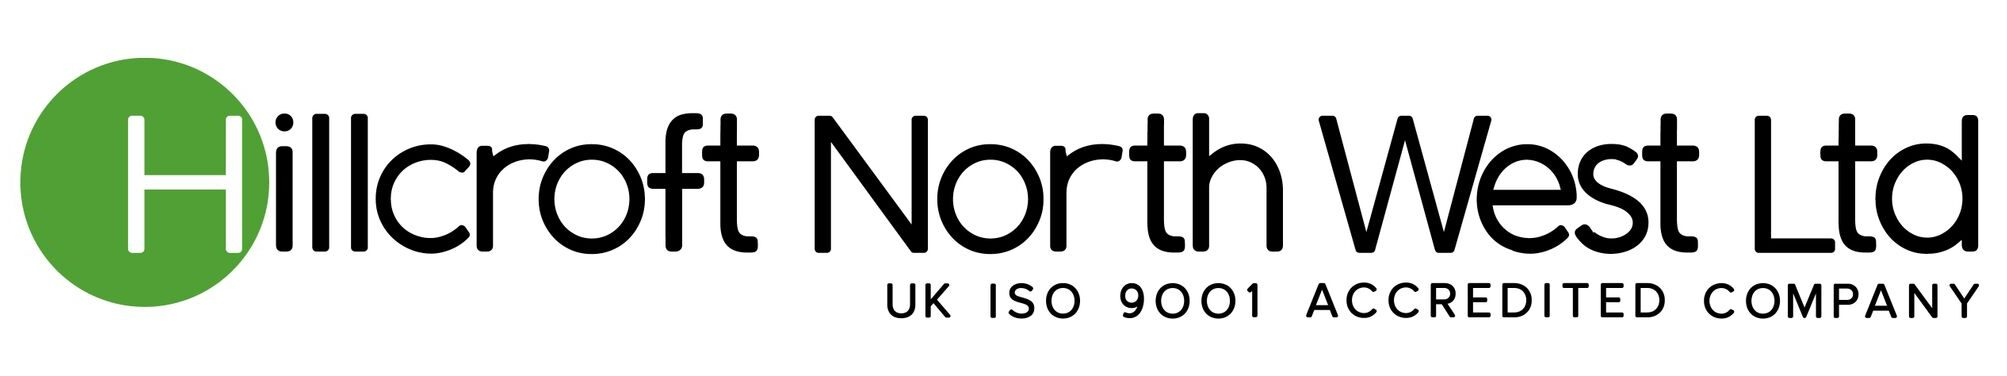 Hillcroft Northwest Ltd